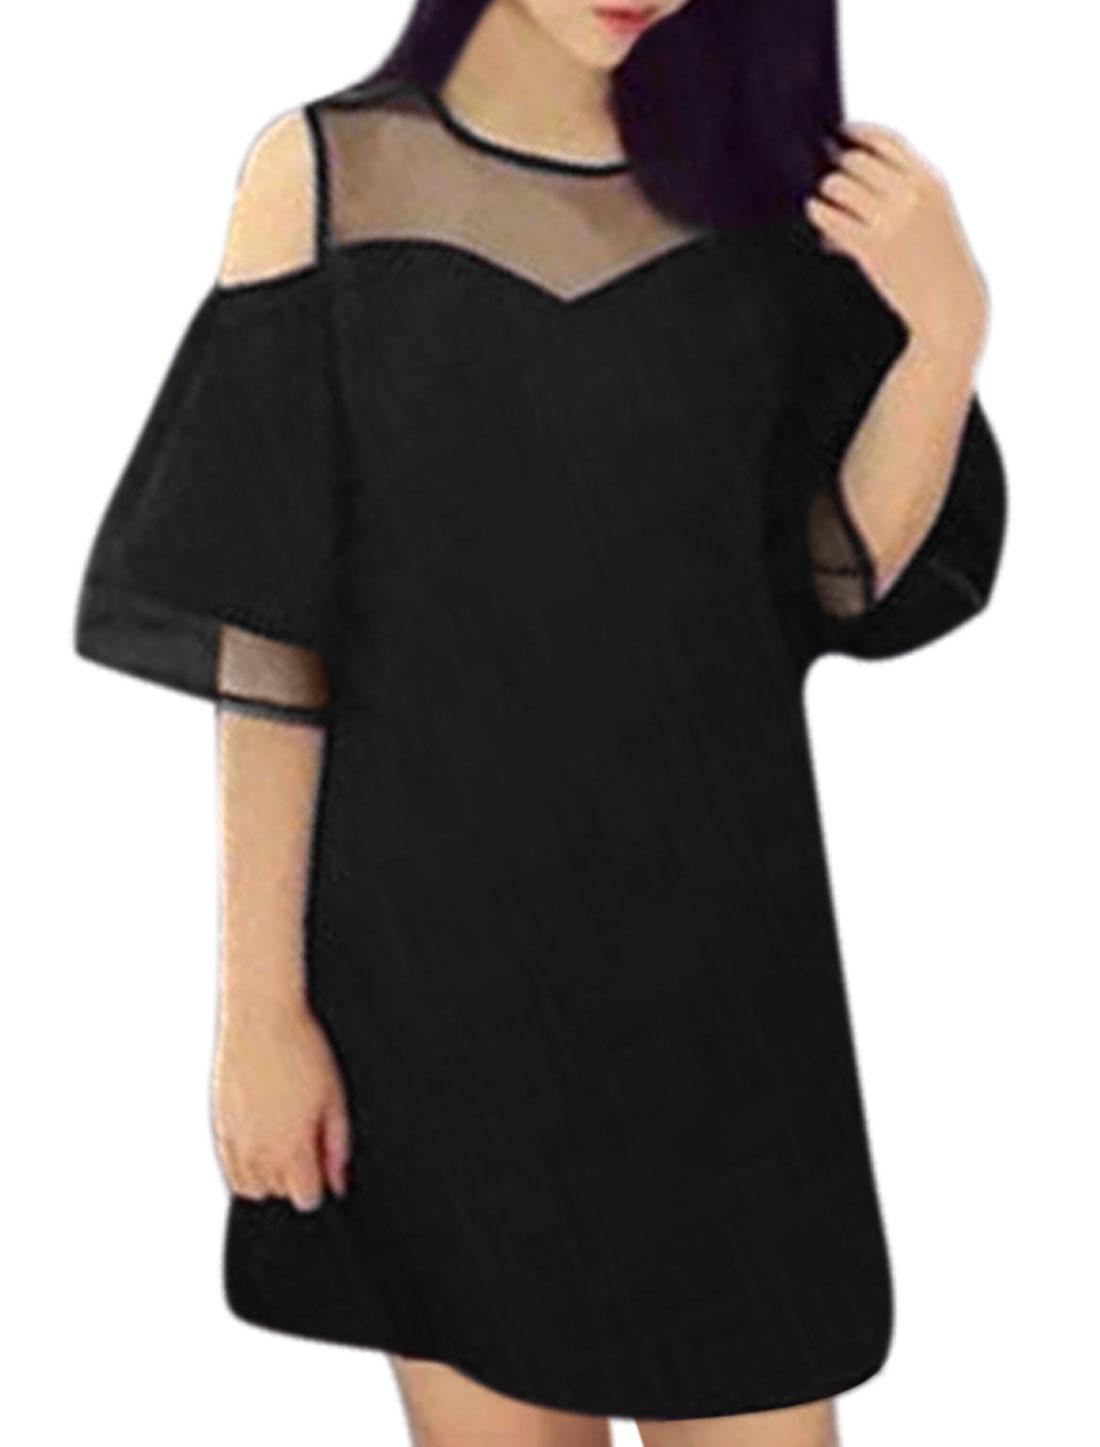 Women Cut Out Shoulder Organza Panel Tunic Dress Black XS